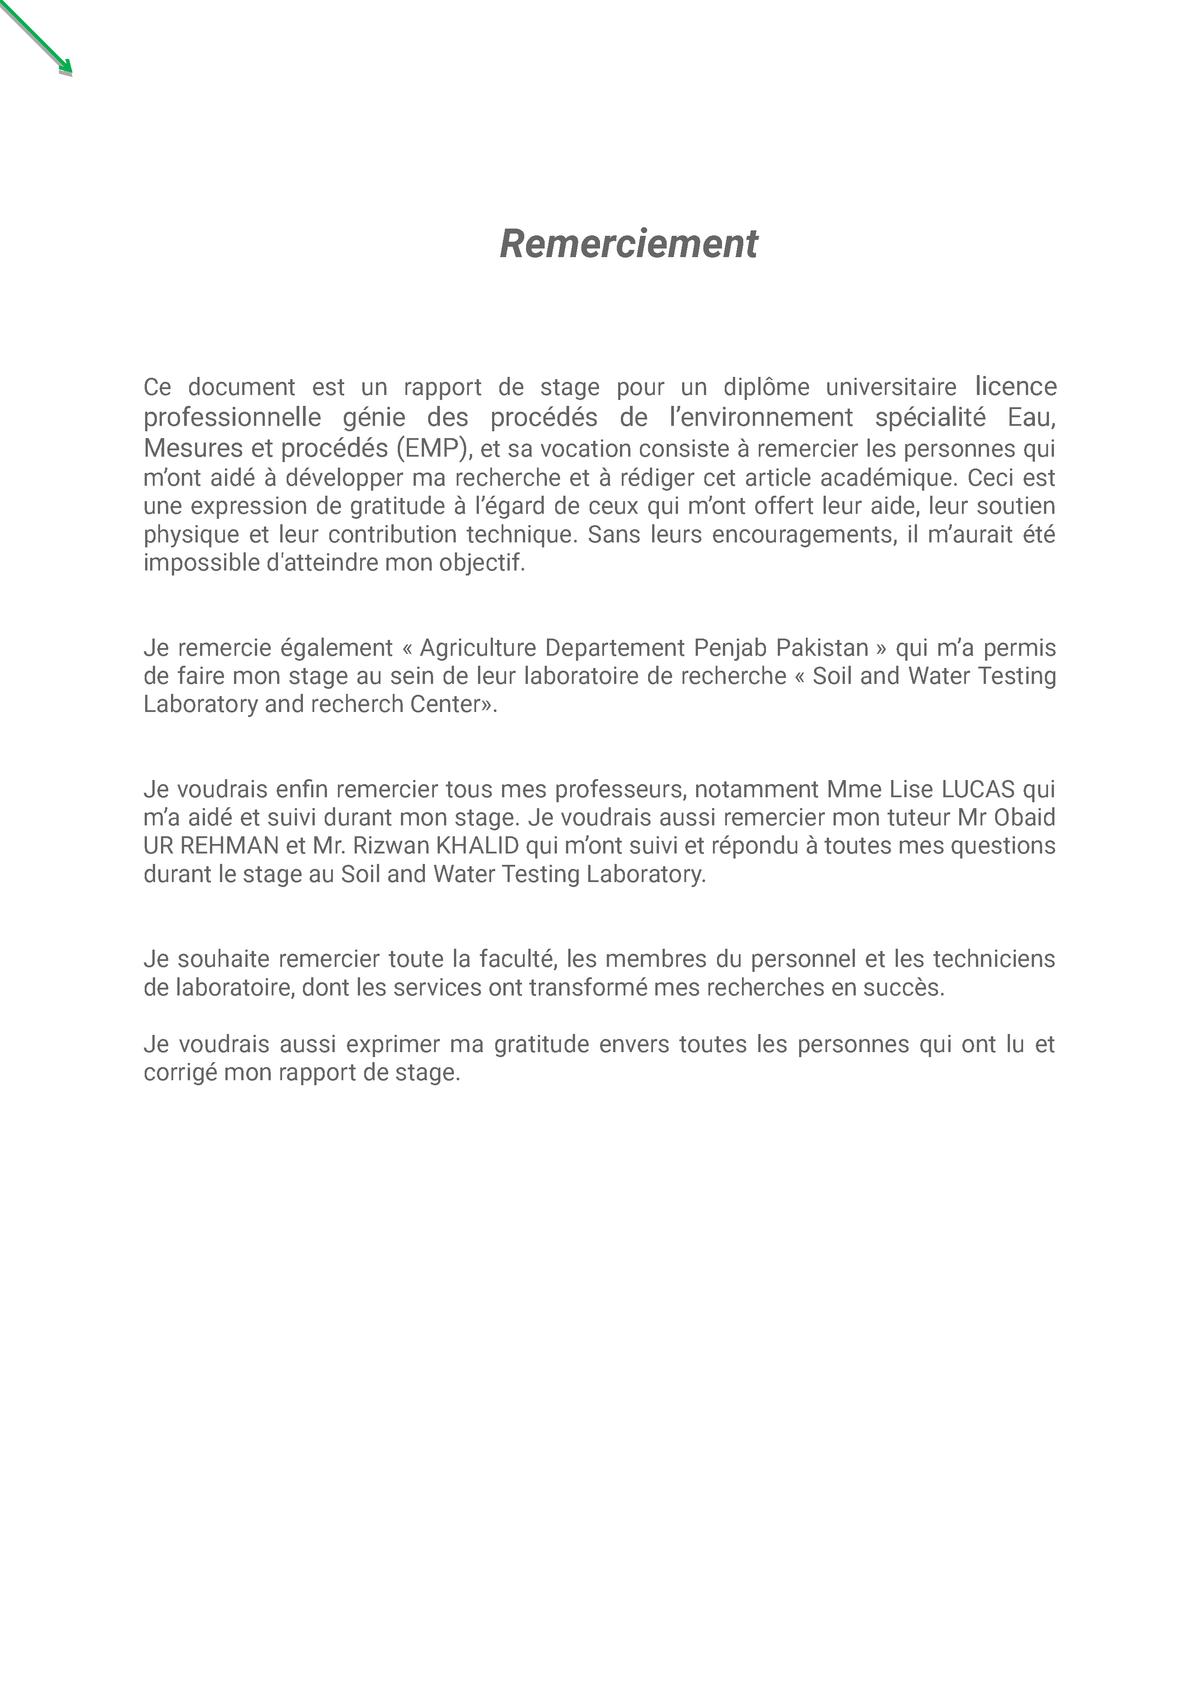 Rapport De Stage Microbiologie Et Immunologie Lorraine